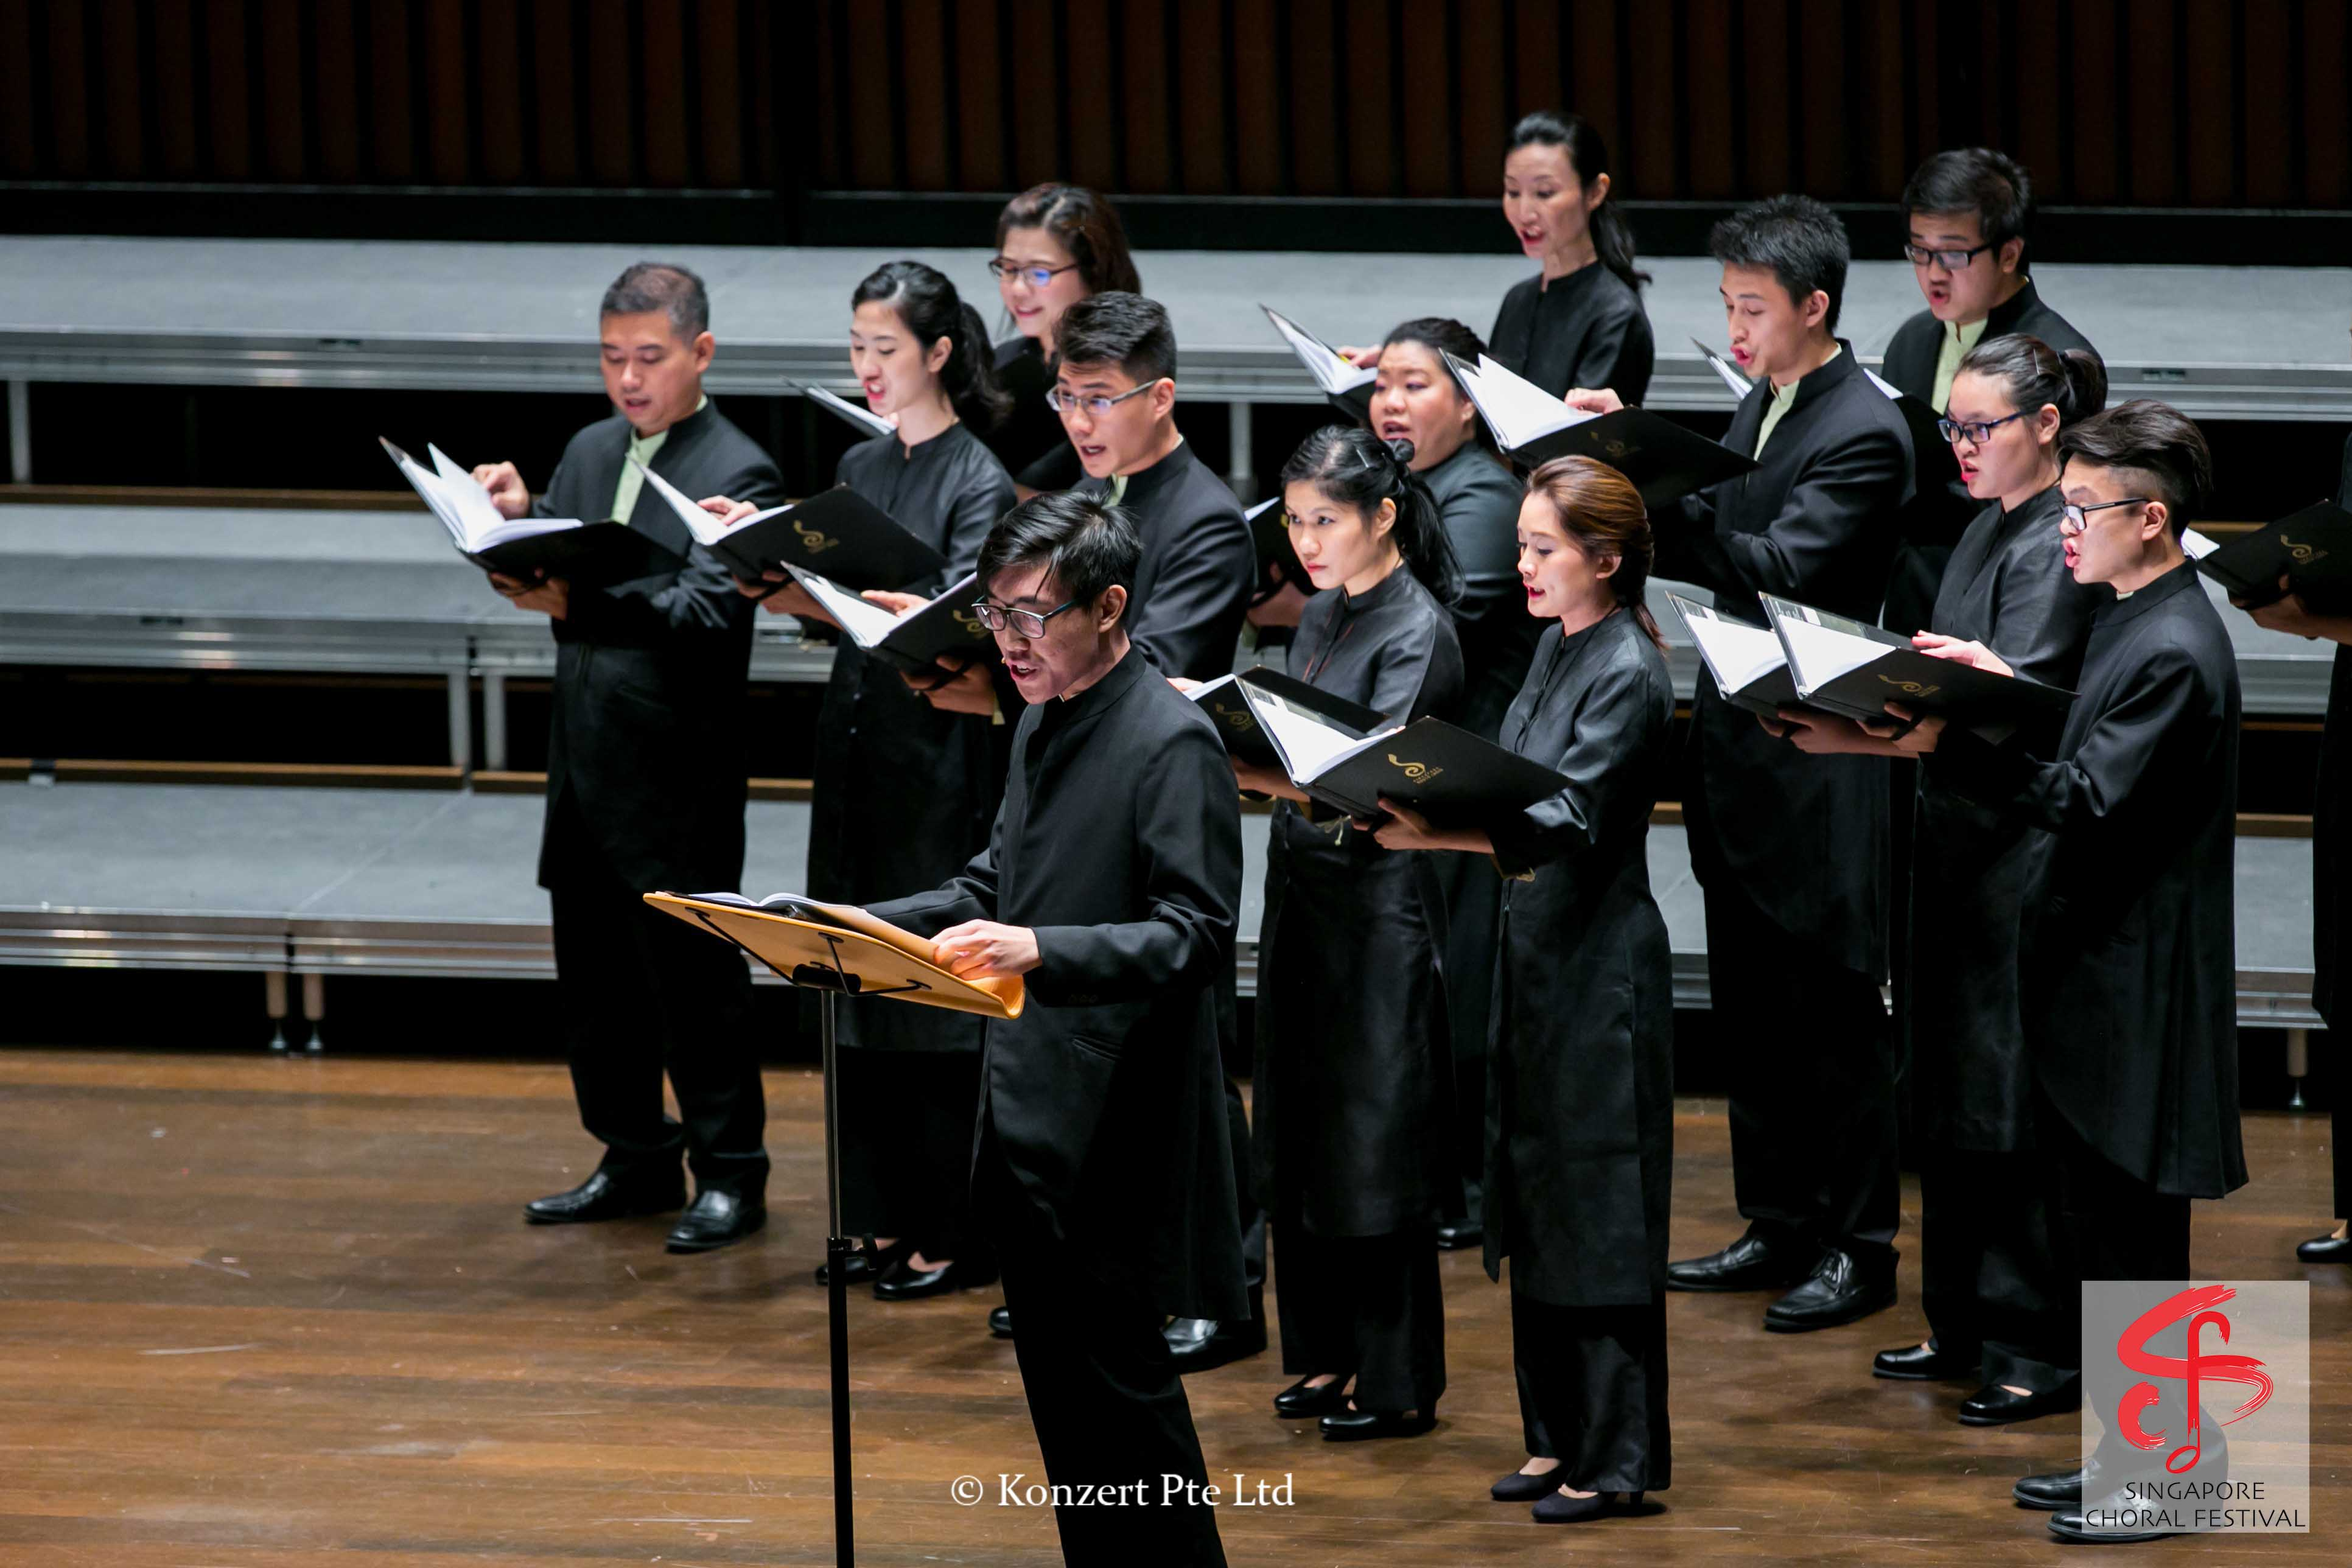 Singapore Choral Festival 8-8-15 (235).jpg